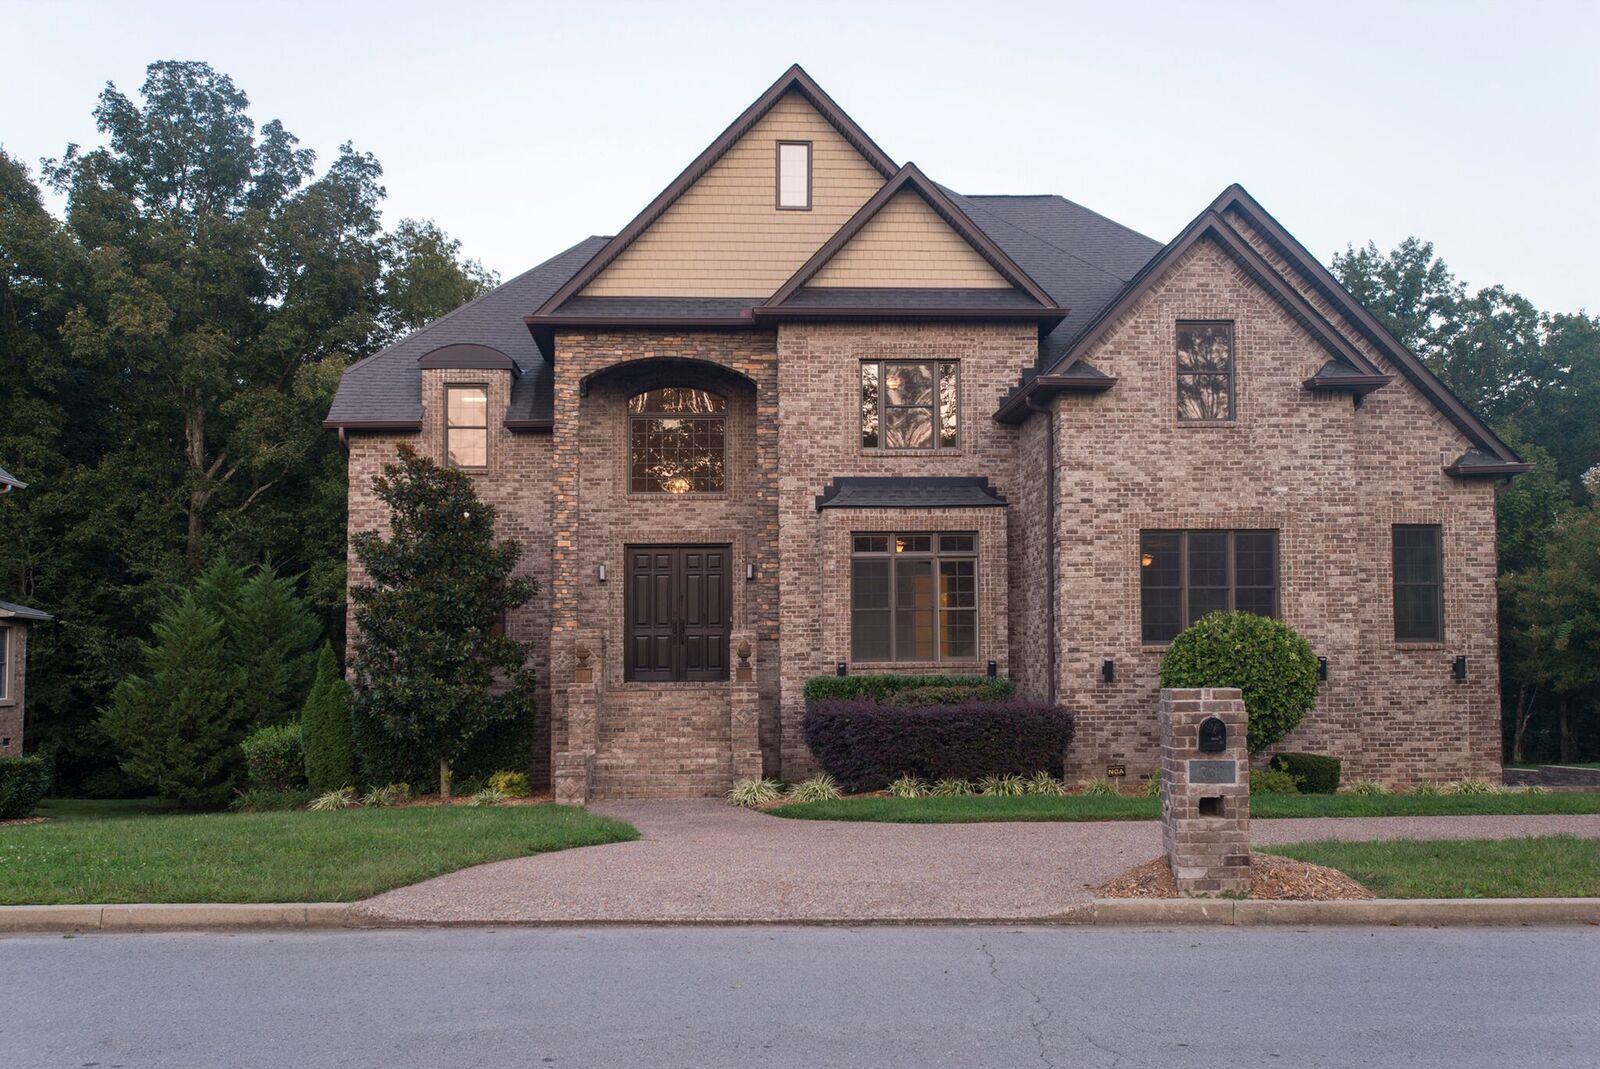 704 Ridgecrest Ln, Lebanon, Tennessee